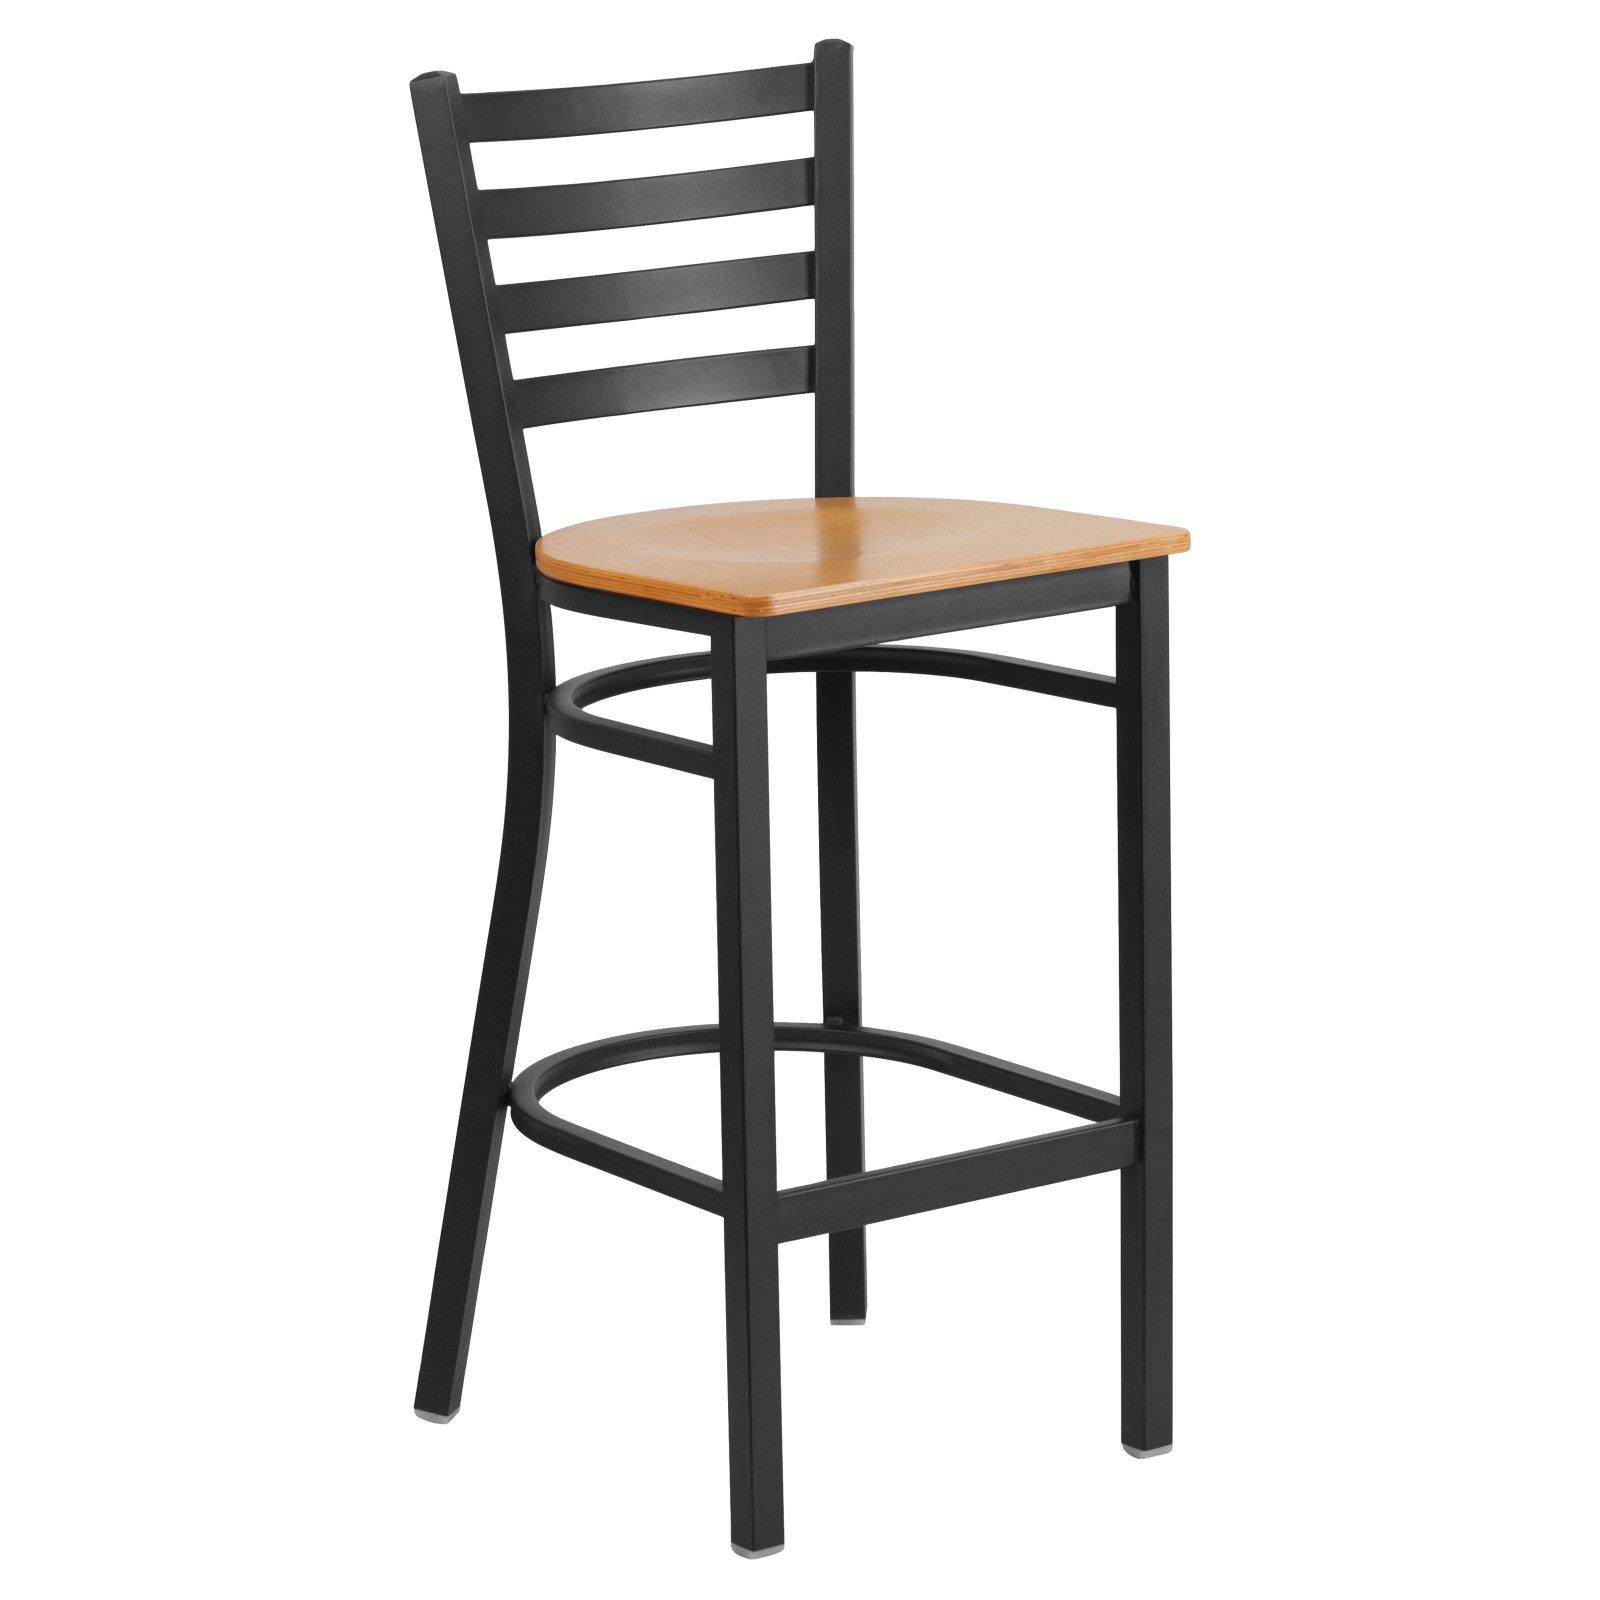 Flash Furniture HERCULES Series Black Ladder Back Metal Restaurant Barstool - Wood Seat Multiple Colors